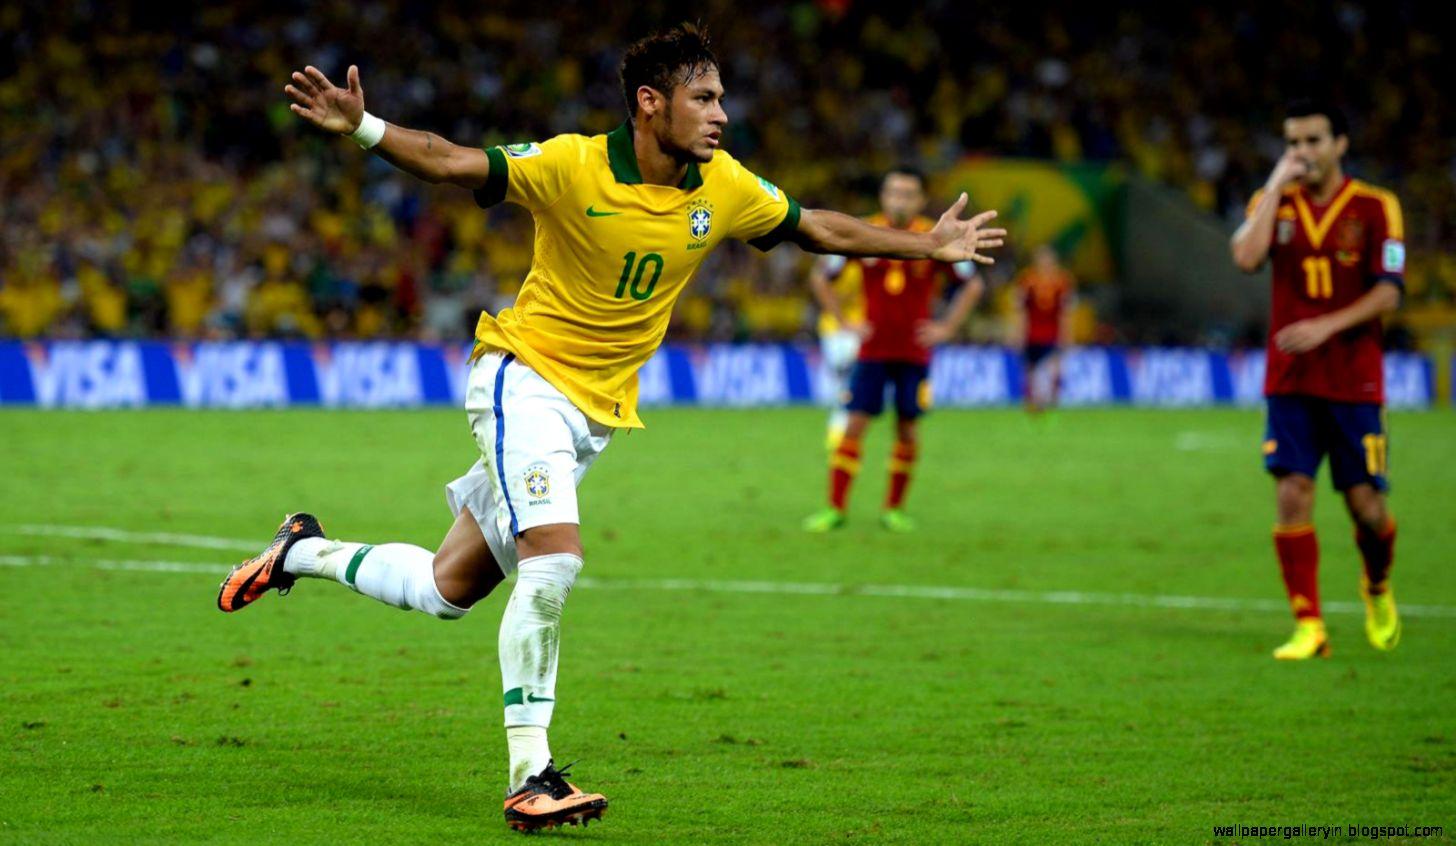 Neymar Sebut Meksiko Banyak Omong